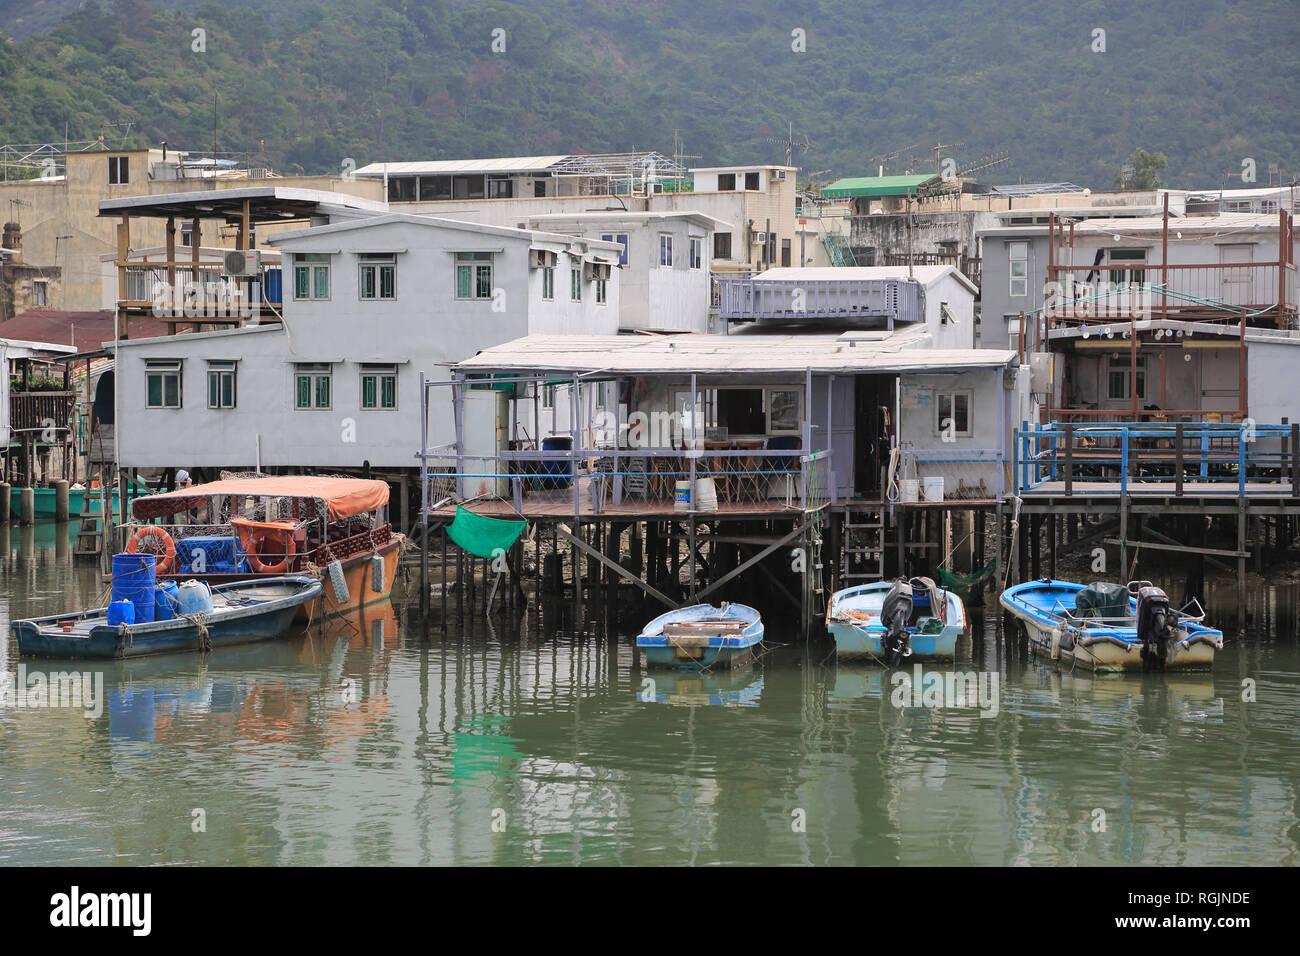 Stilt Houses, Canal, Tai O Fishing Village, Lantau Island, Hong Kong, China, Asia - Stock Image